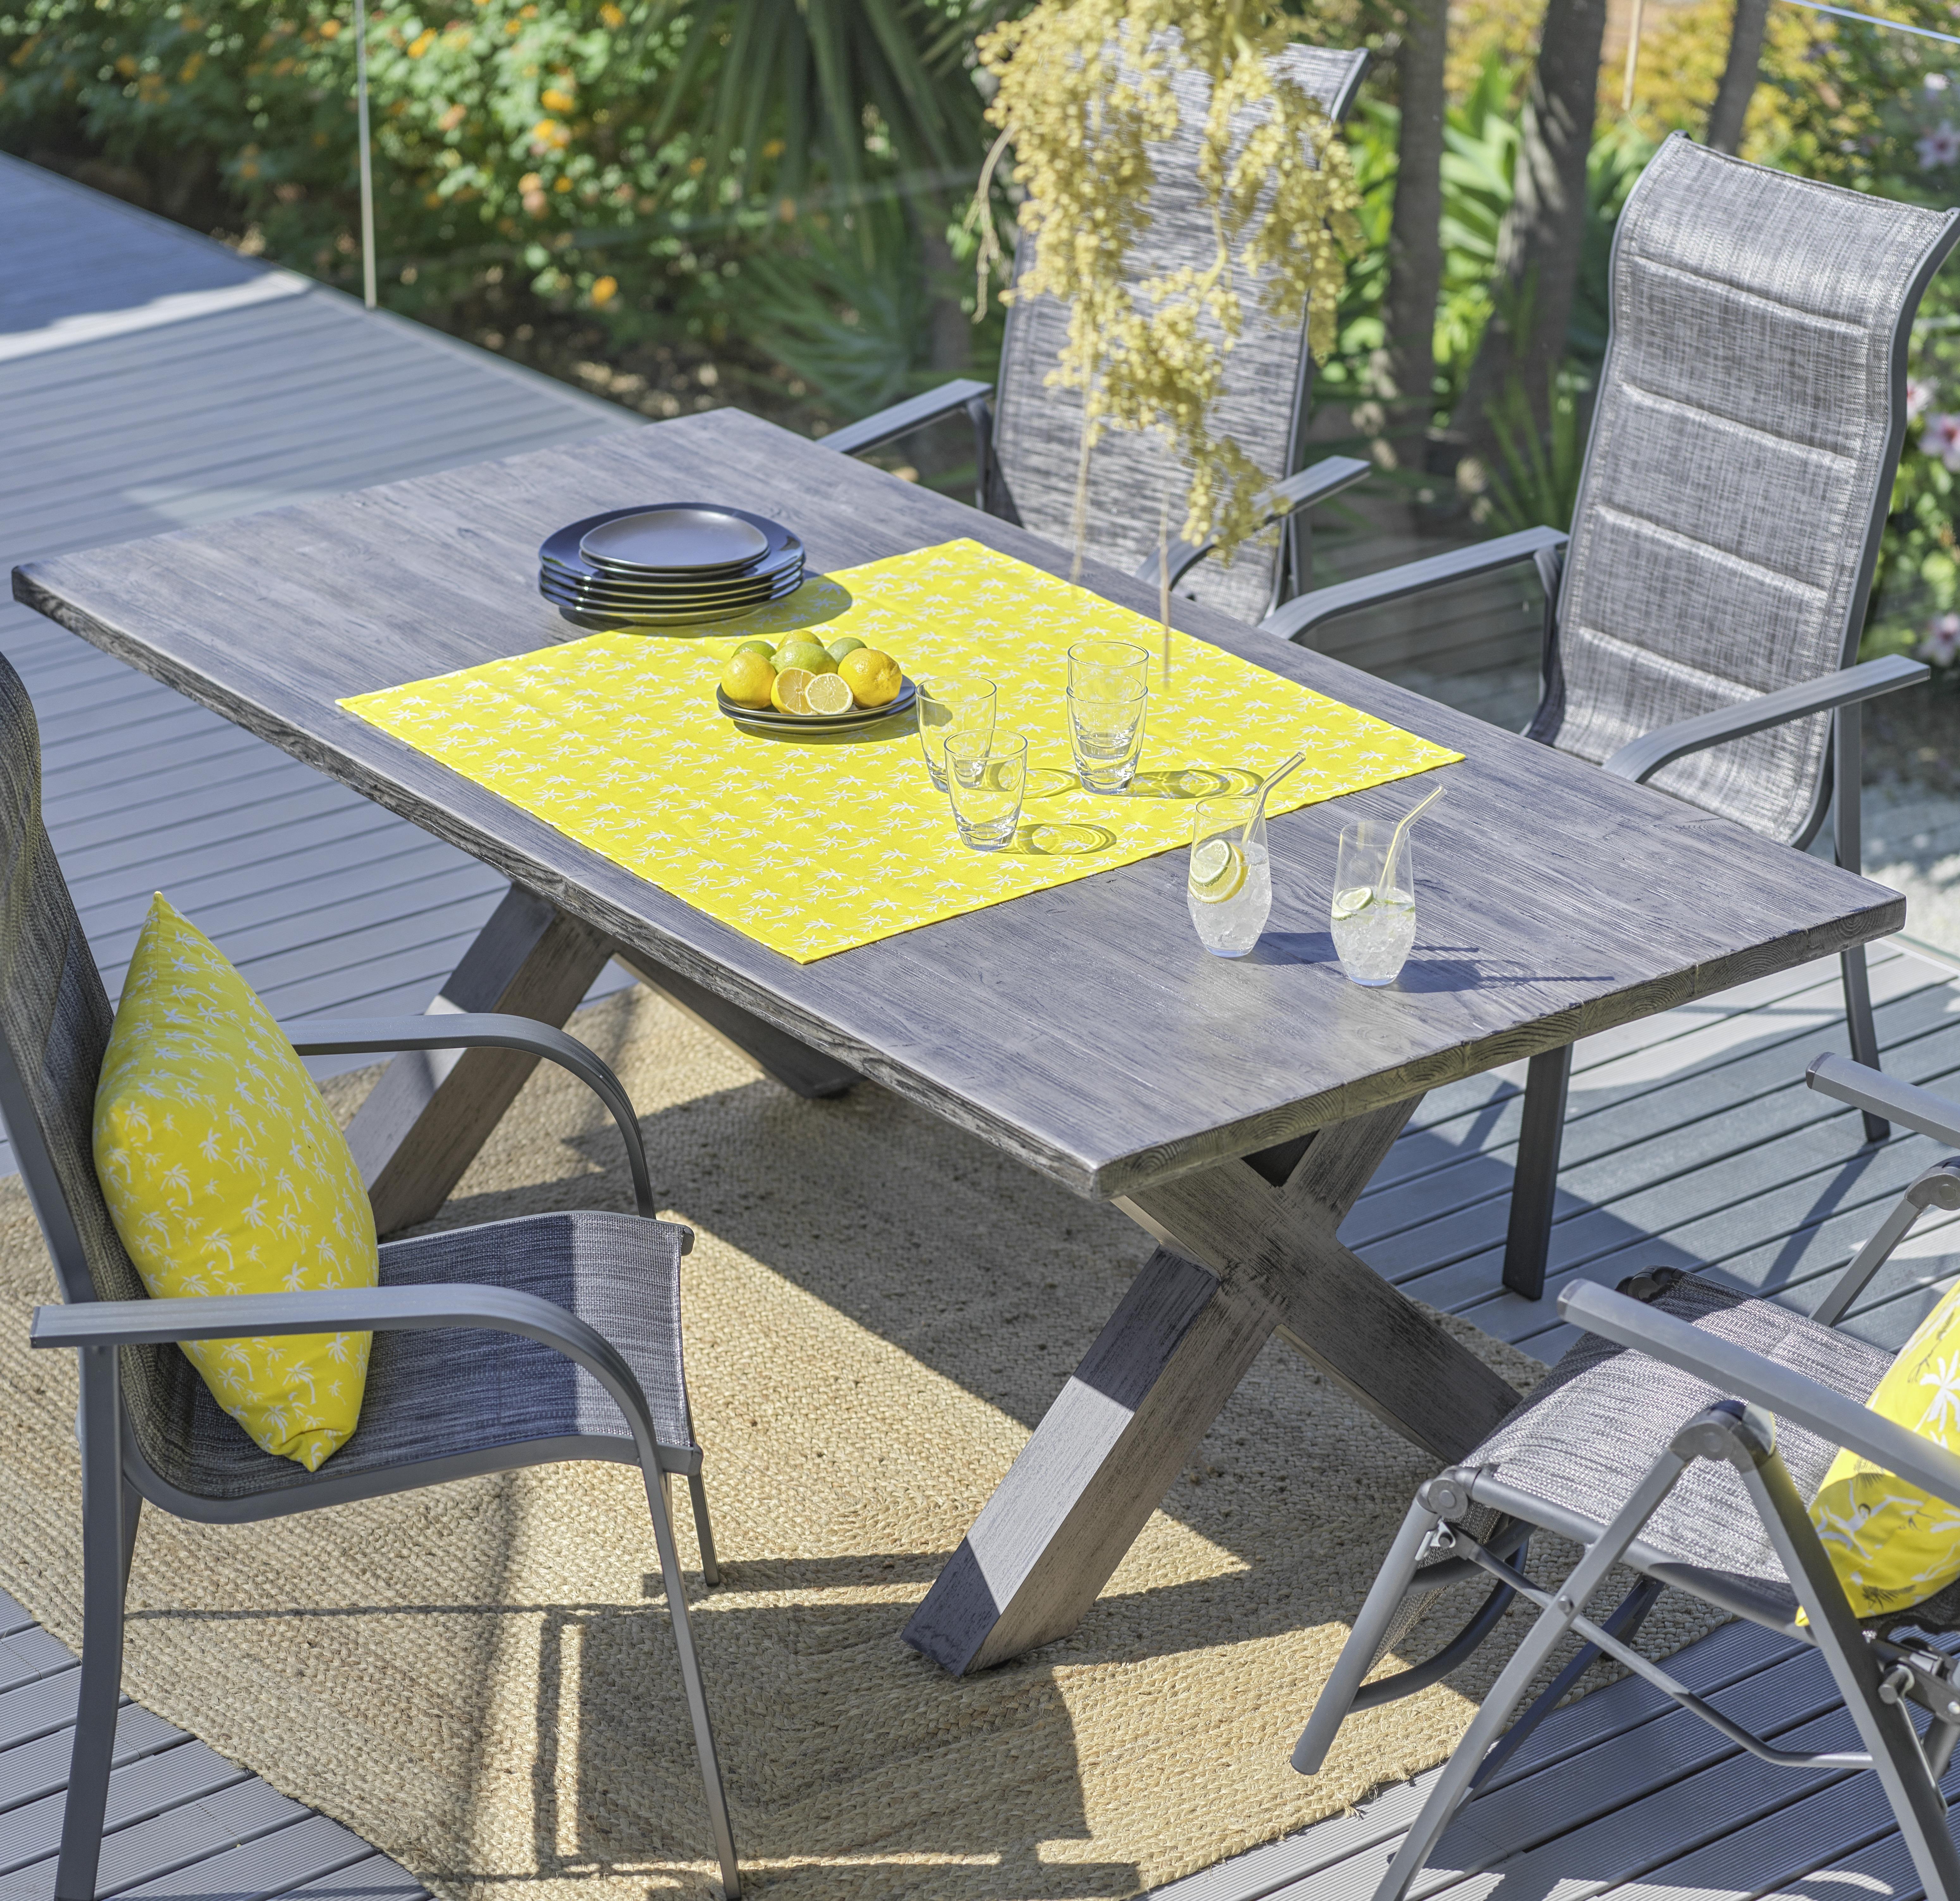 Gartentisch Kuba In Grau In 2021 Gartentisch Gartentisch Aluminium Lounge Mobel